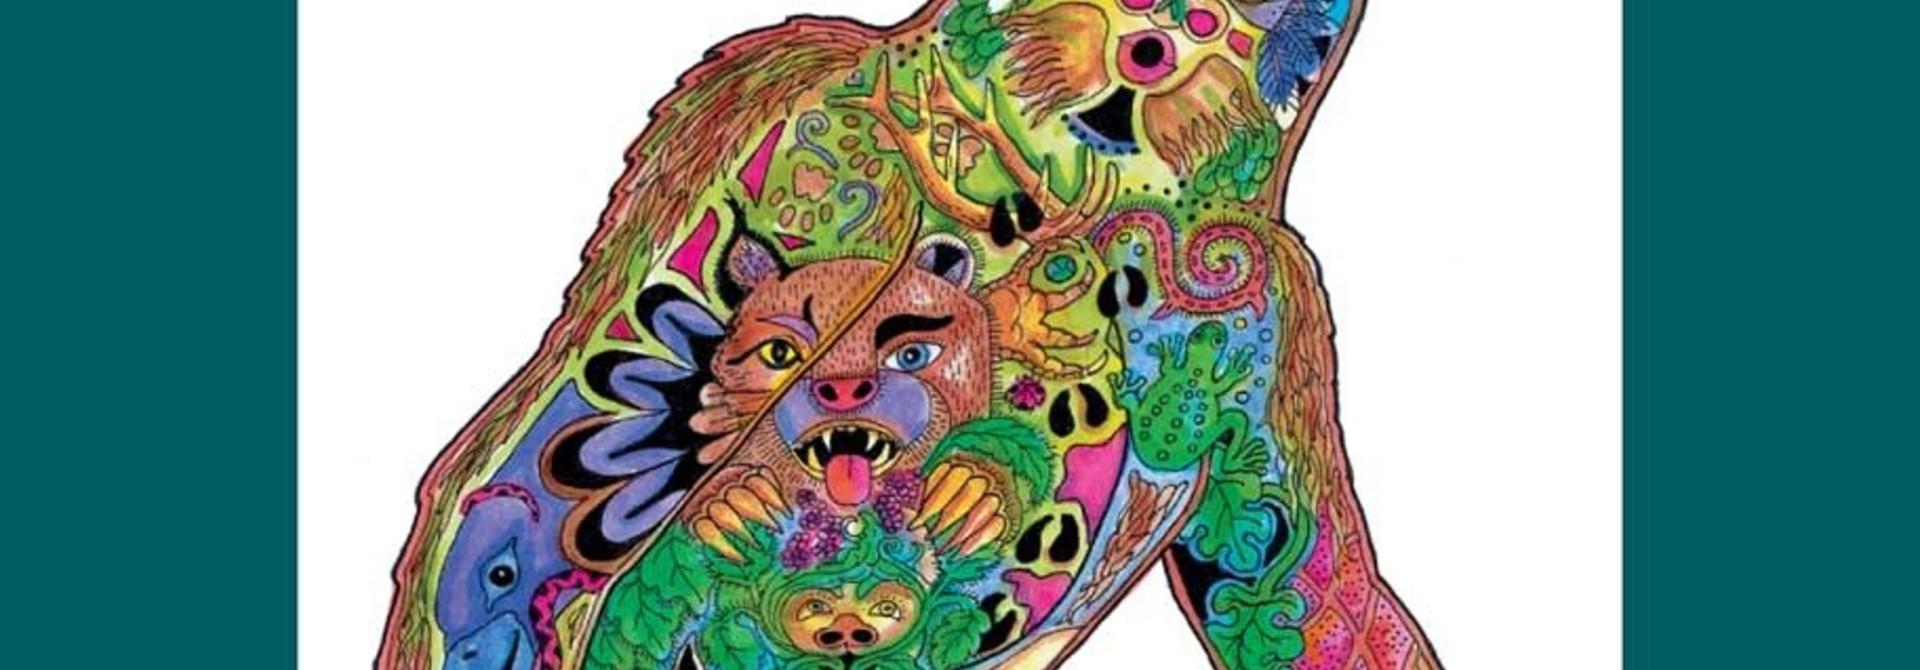 72 Piece Puzzle - Sasquatch by Sue Coccia